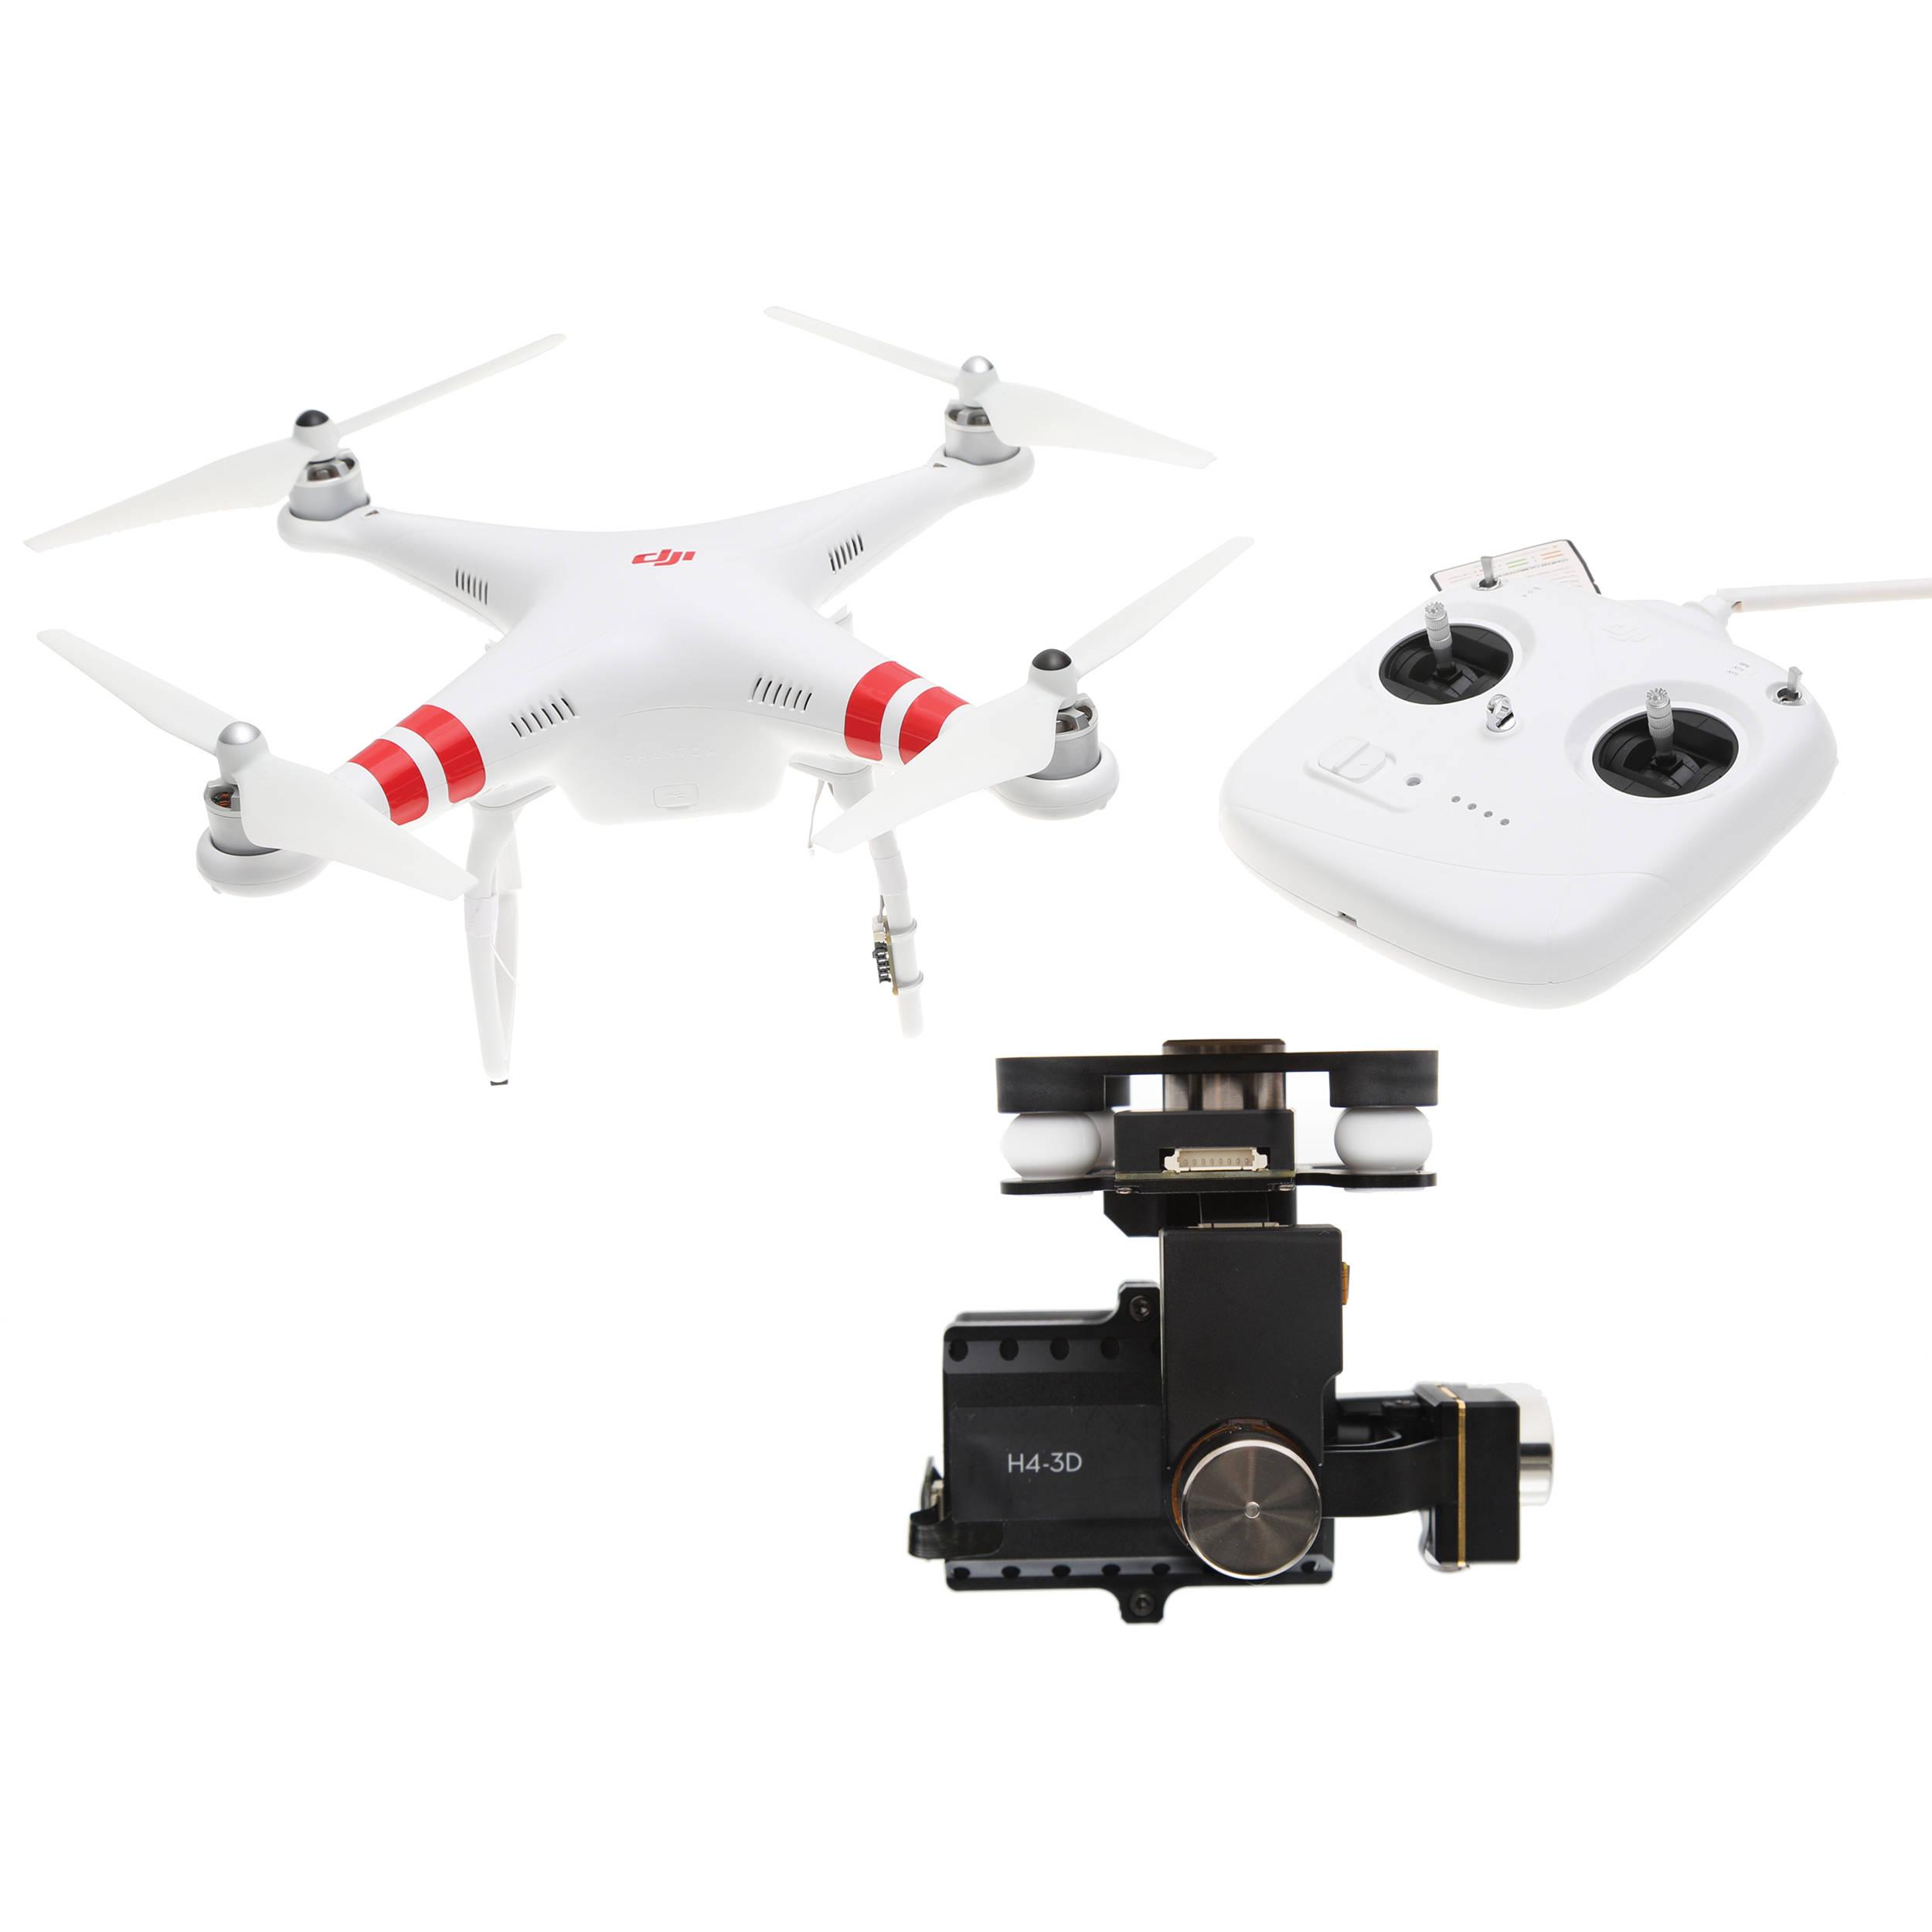 DJI Phantom 2 Quadcopter v2 0 with Zenmuse H4-3D Gimbal Kit